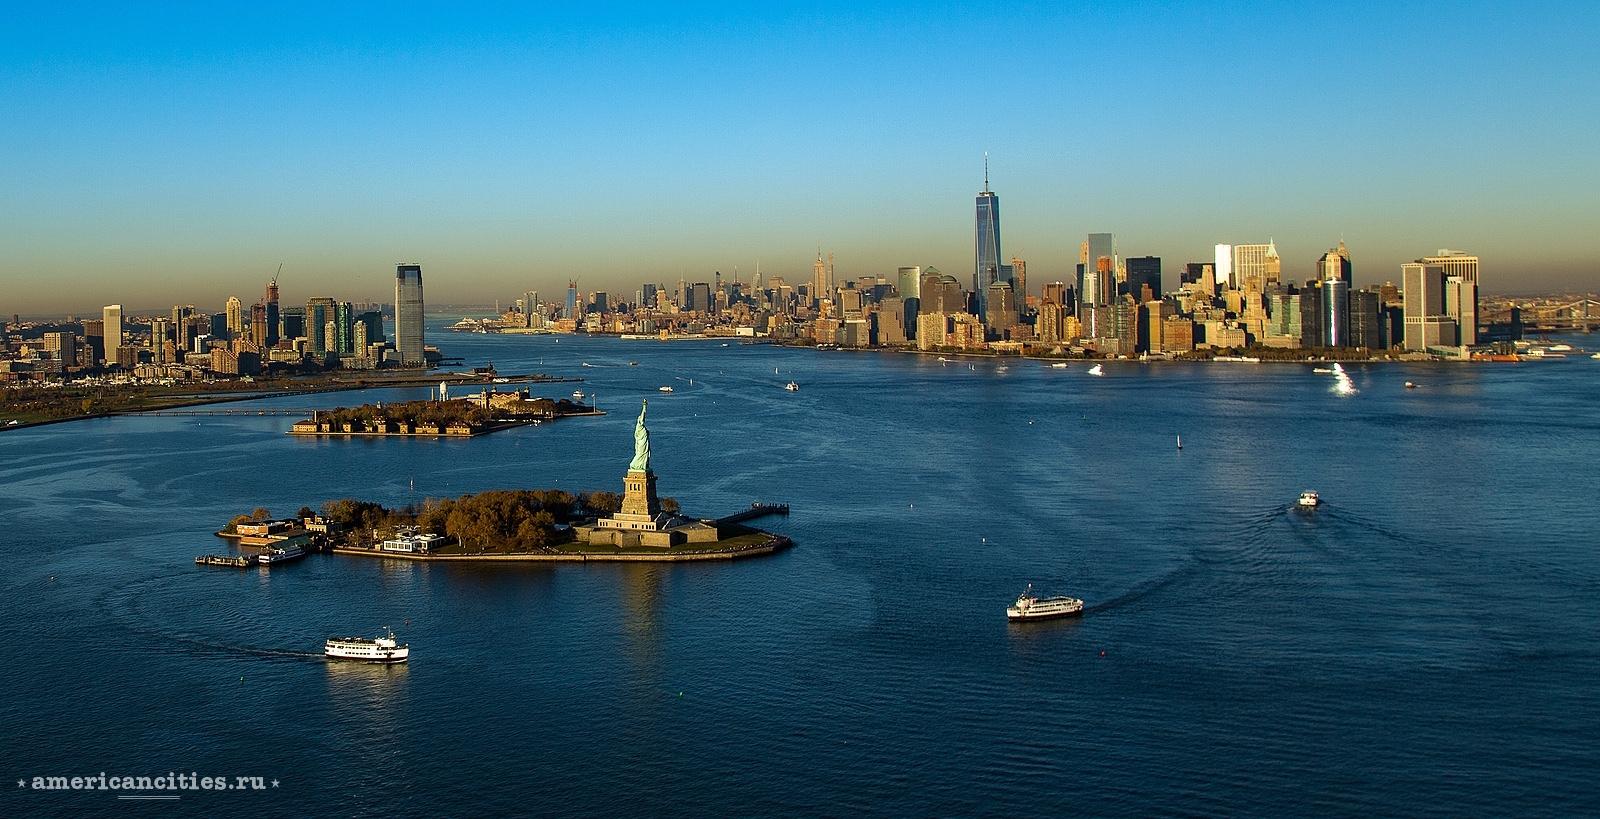 Джерси-Сити (слева) и Манхэттен (справа). На переднем плане Статуя Свободы на острове Либерти Айленд и остров Эллис Айленд